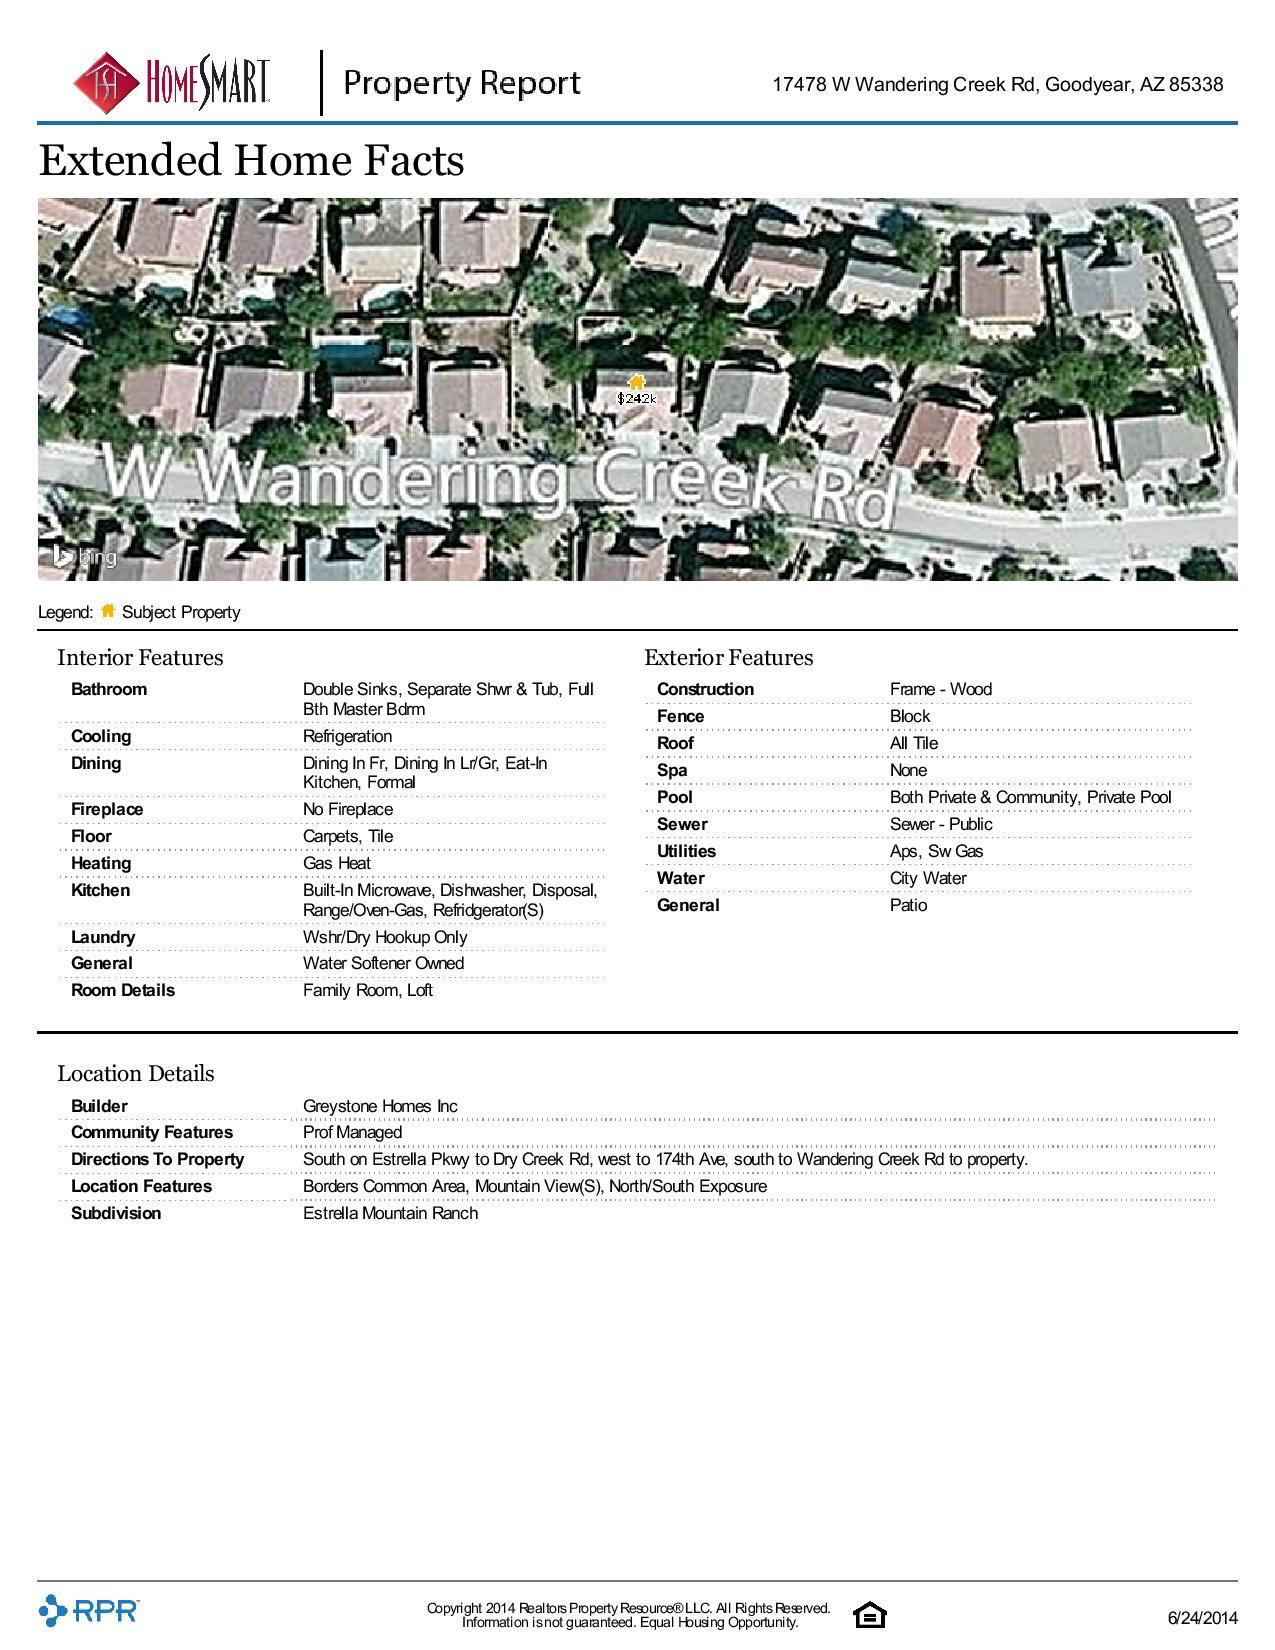 17478-W-Wandering-Creek-Rd-Goodyear-AZ-85338-page-004